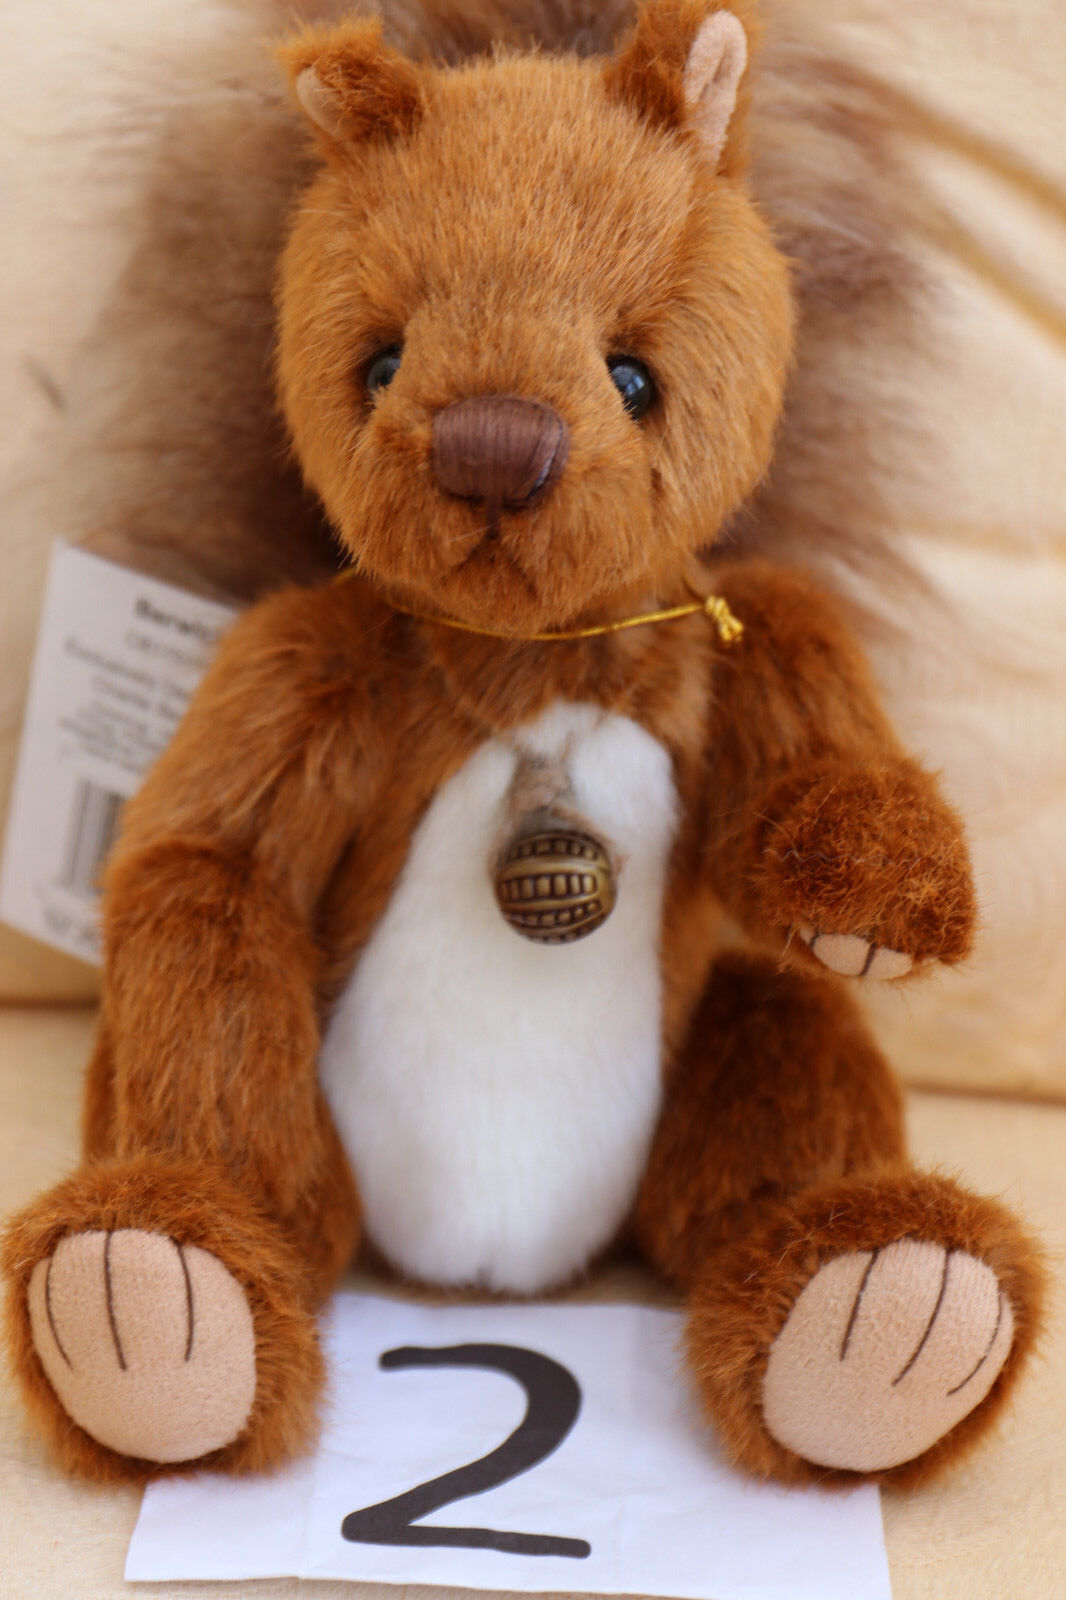 Charlie Bears - Berwick - NEU mit Etikett Etikett Etikett 2017 Sammlung 1f98ee